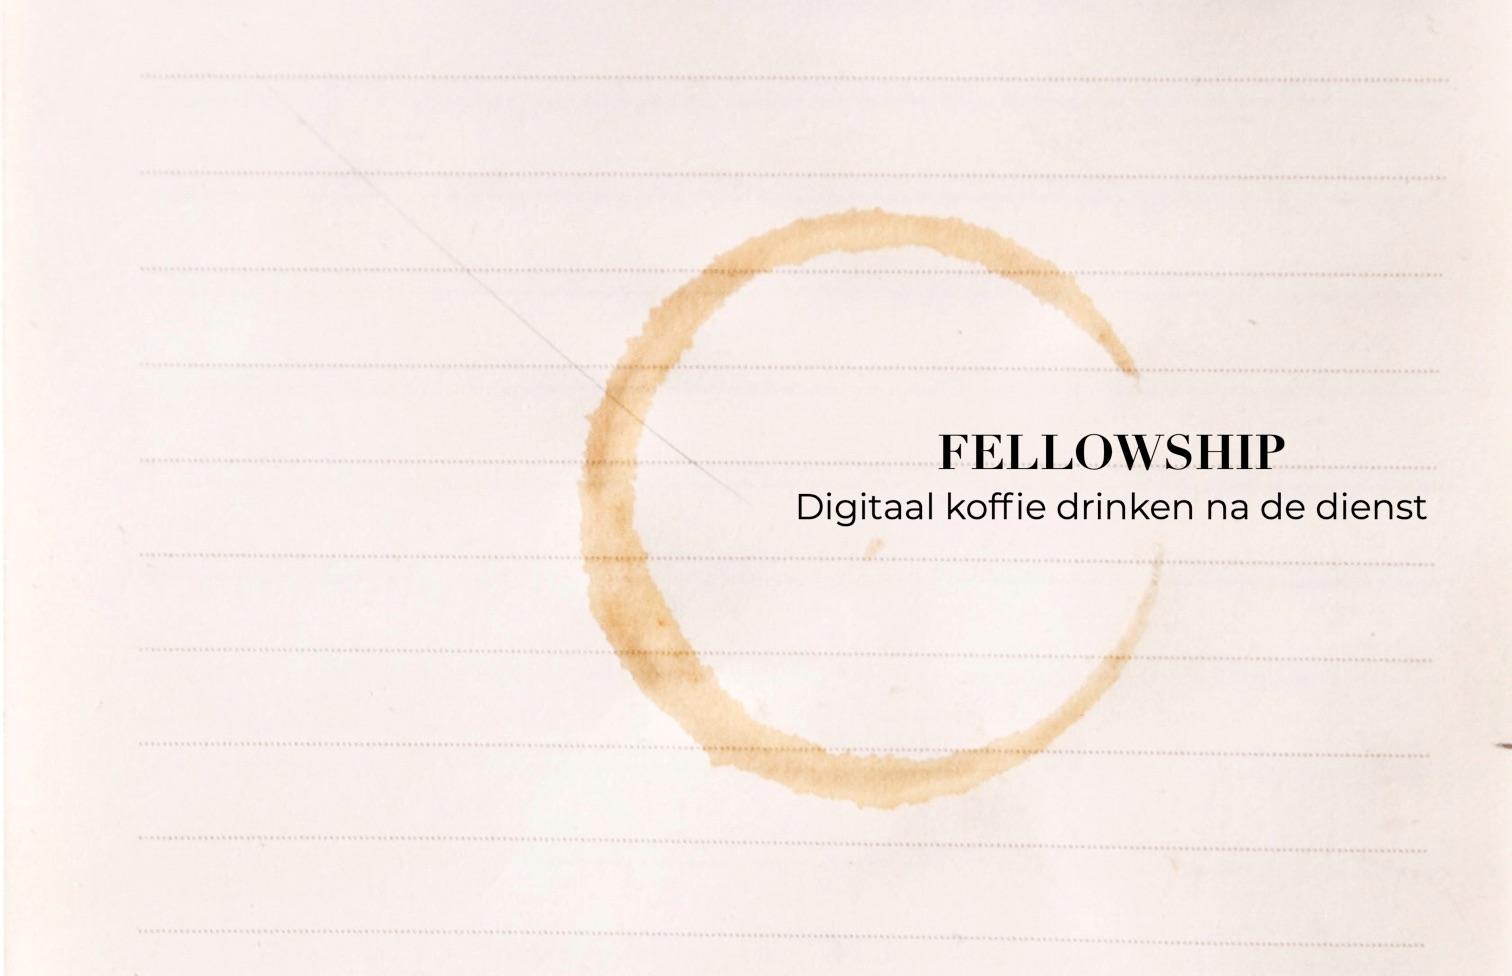 Digitaal koffiedrinken